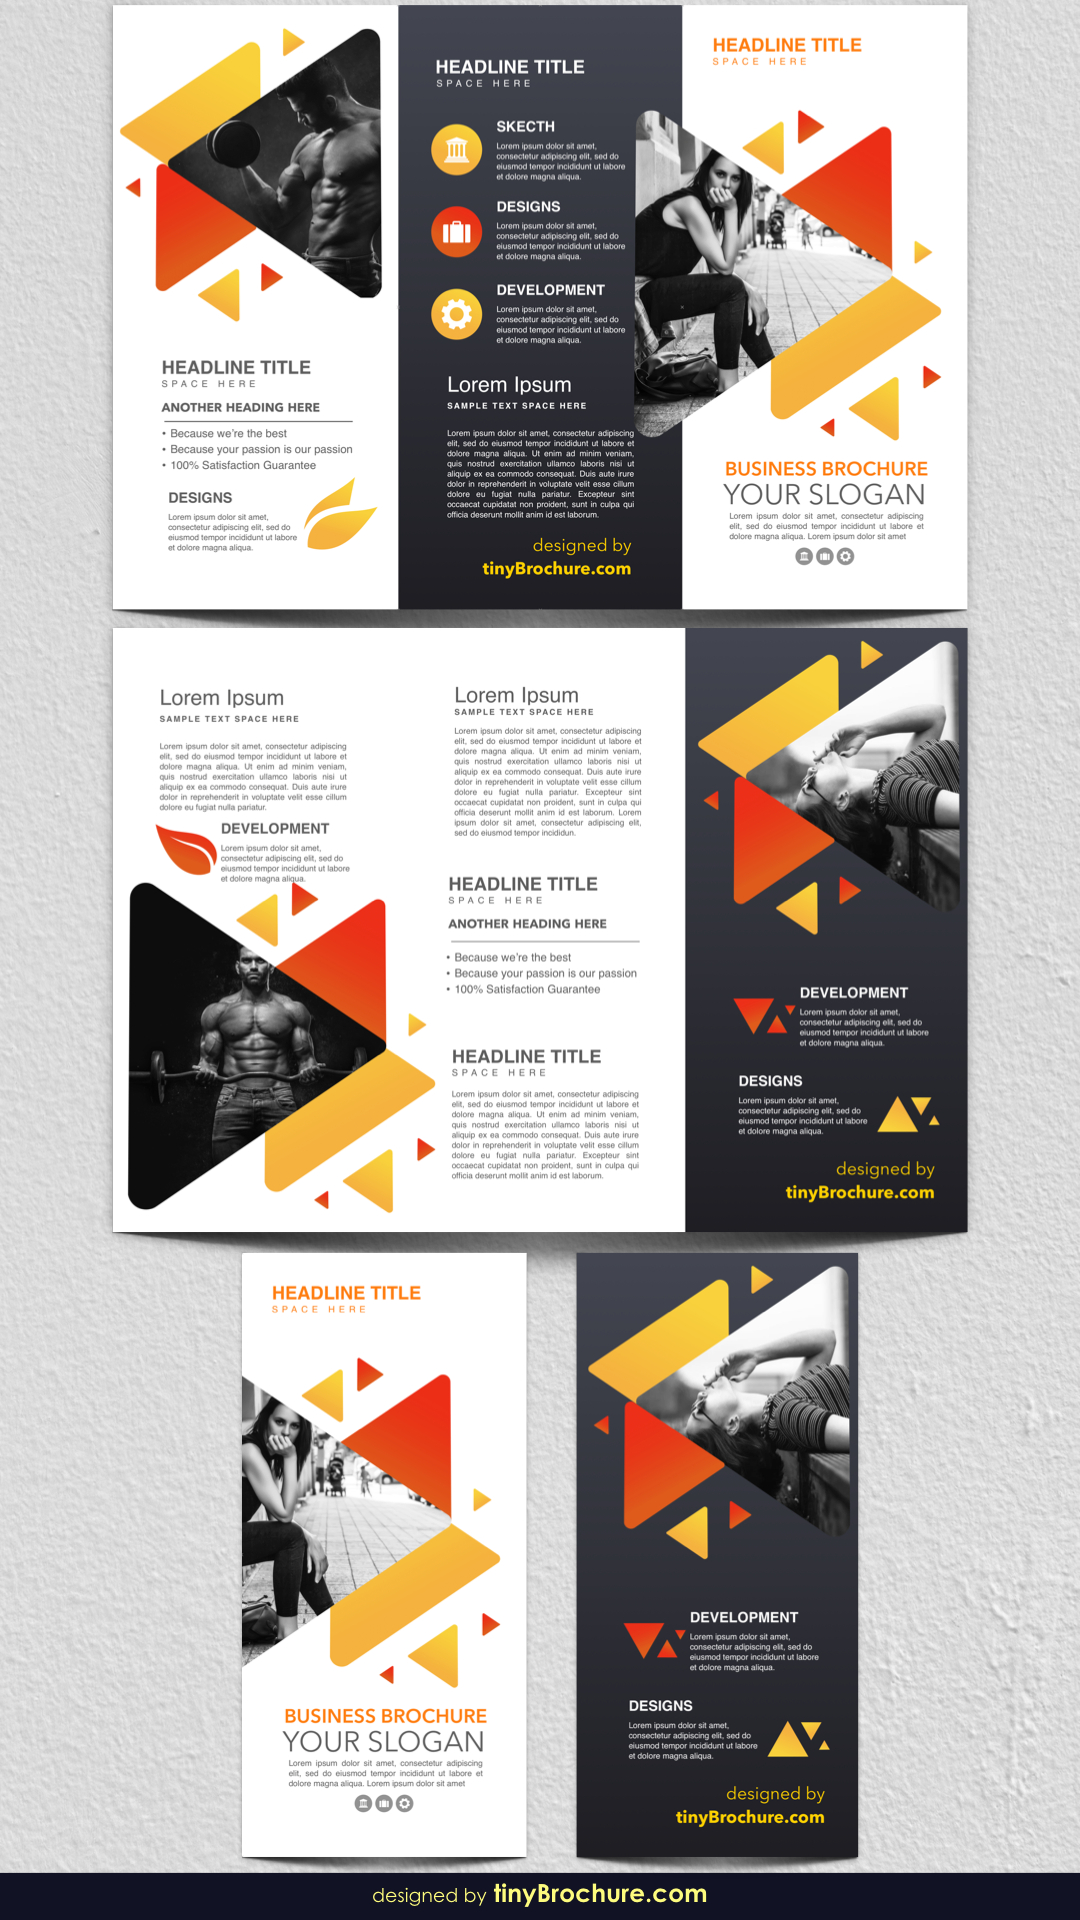 3 Panel Brochure Template Google Docs 2019 | Graphic Design Within Three Panel Brochure Template